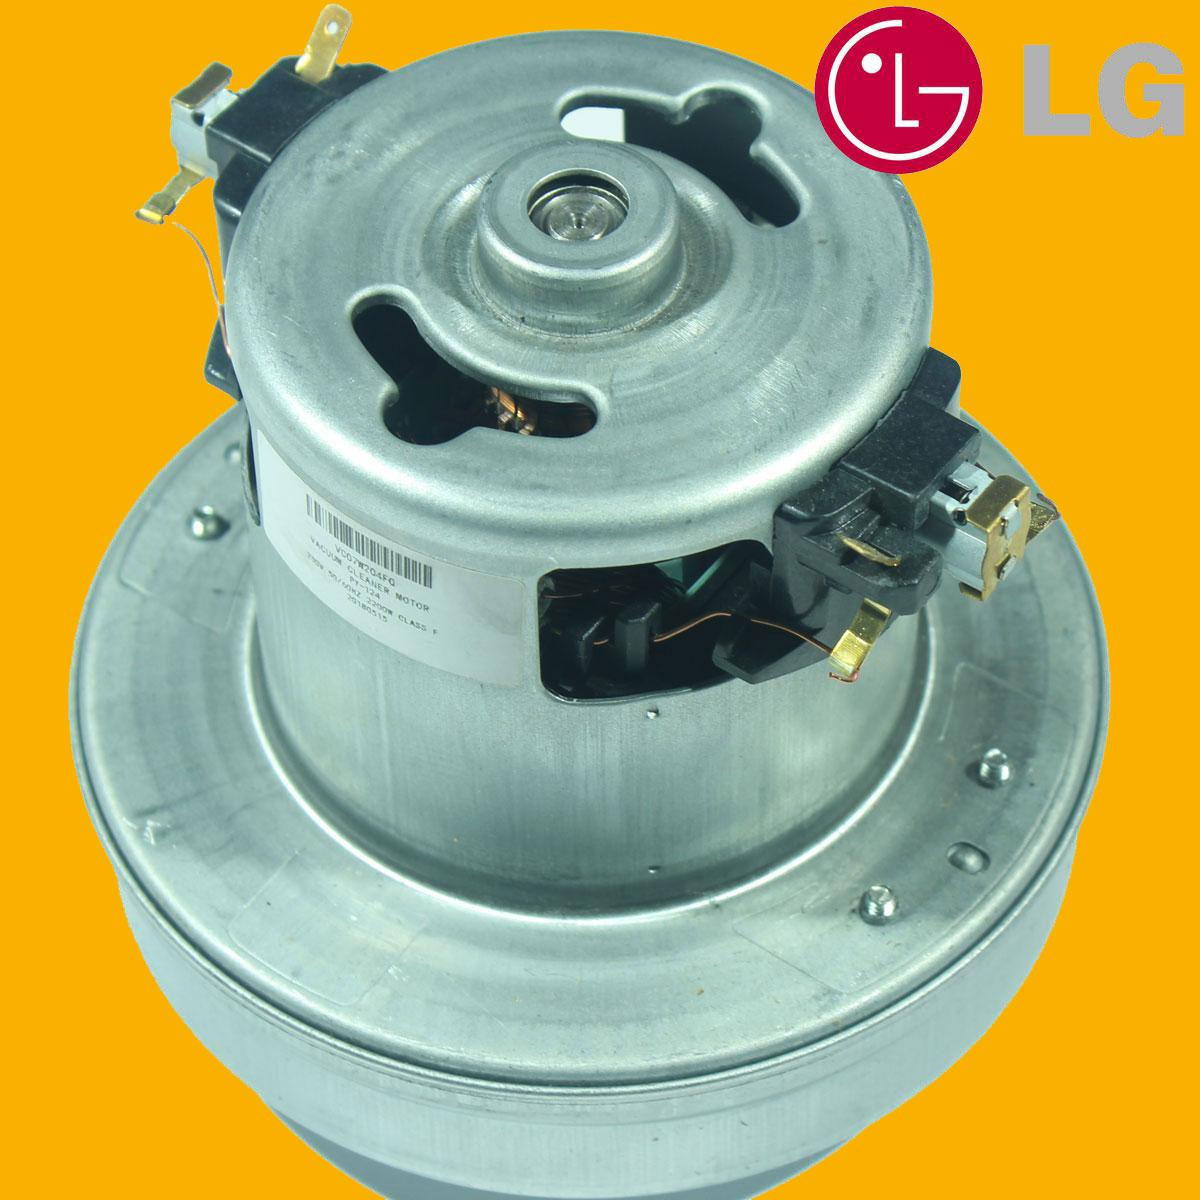 ➜ Двигатель (мотор) 2200W LG для пылесоса VC07W204FQ